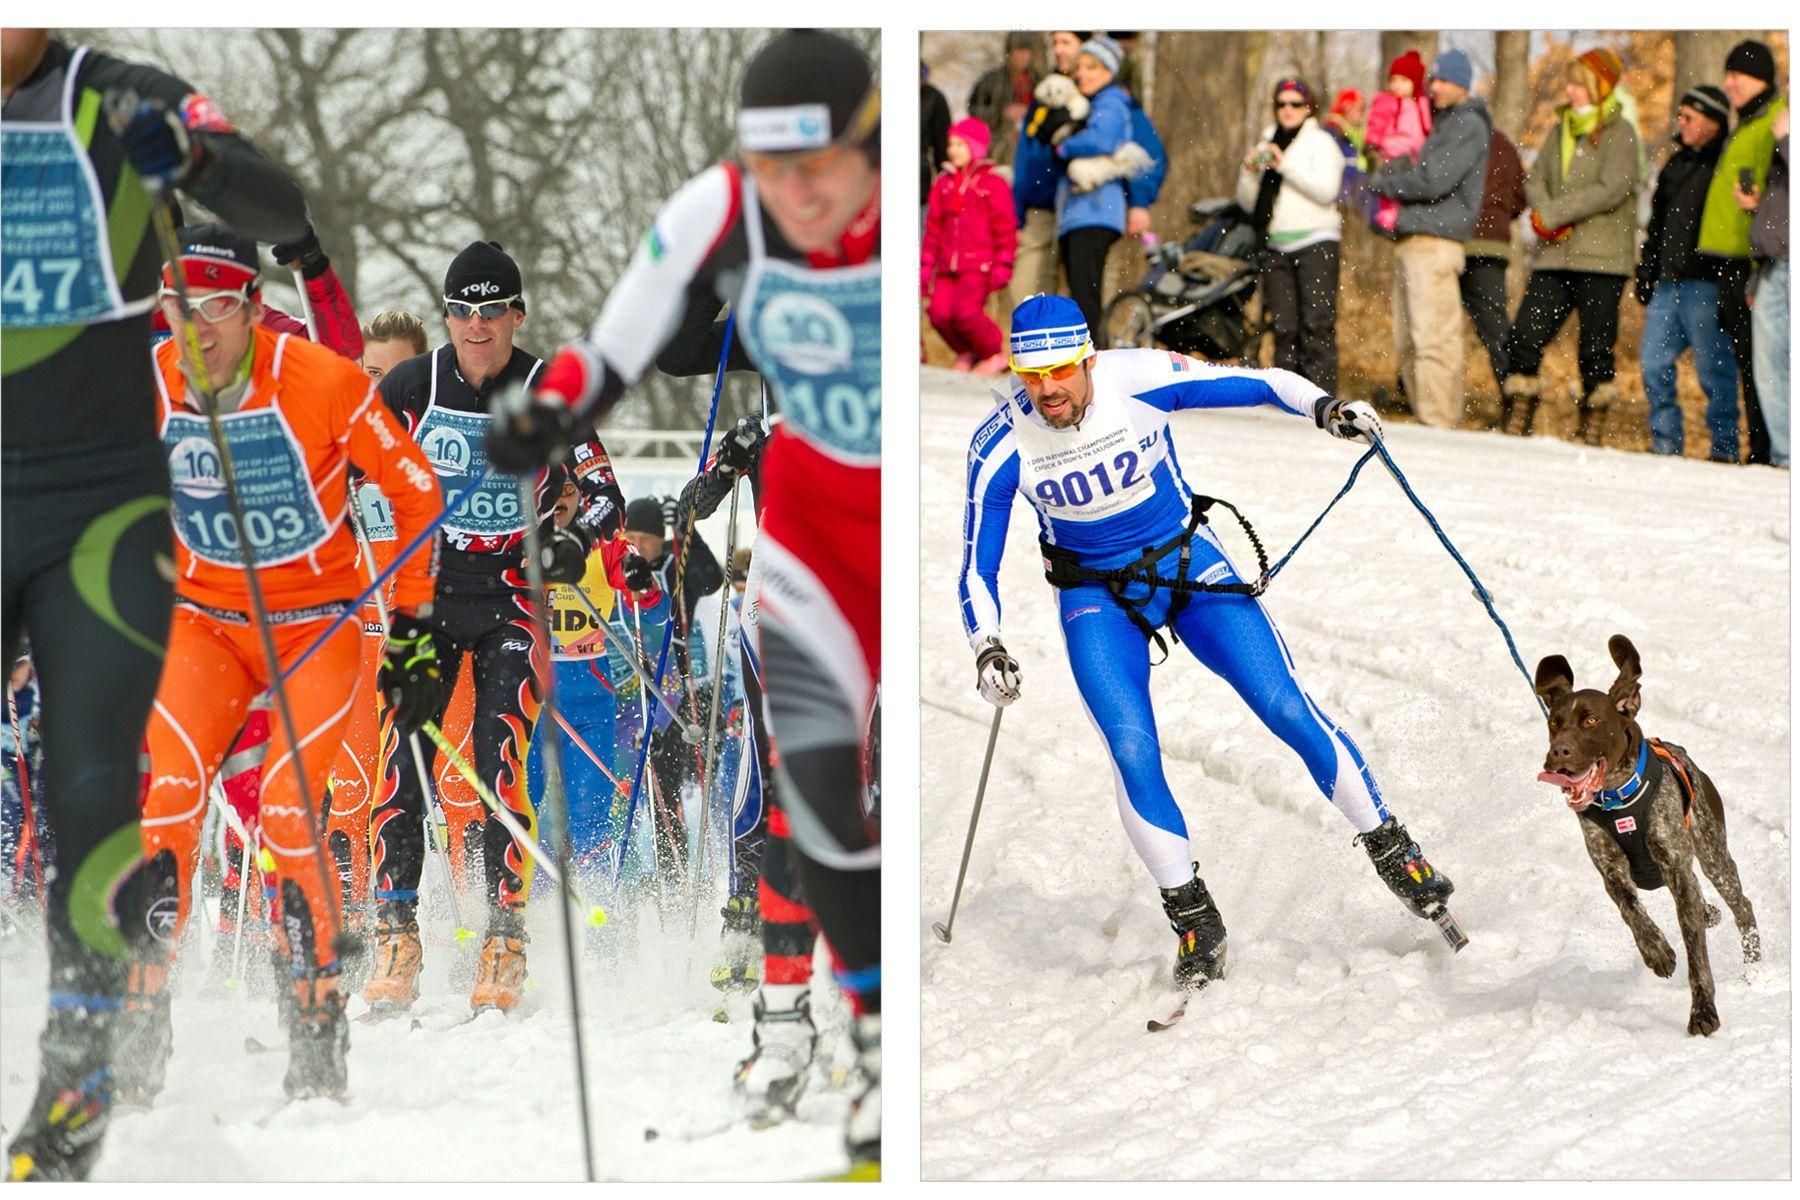 City of Lakes Loppet Ski Festival